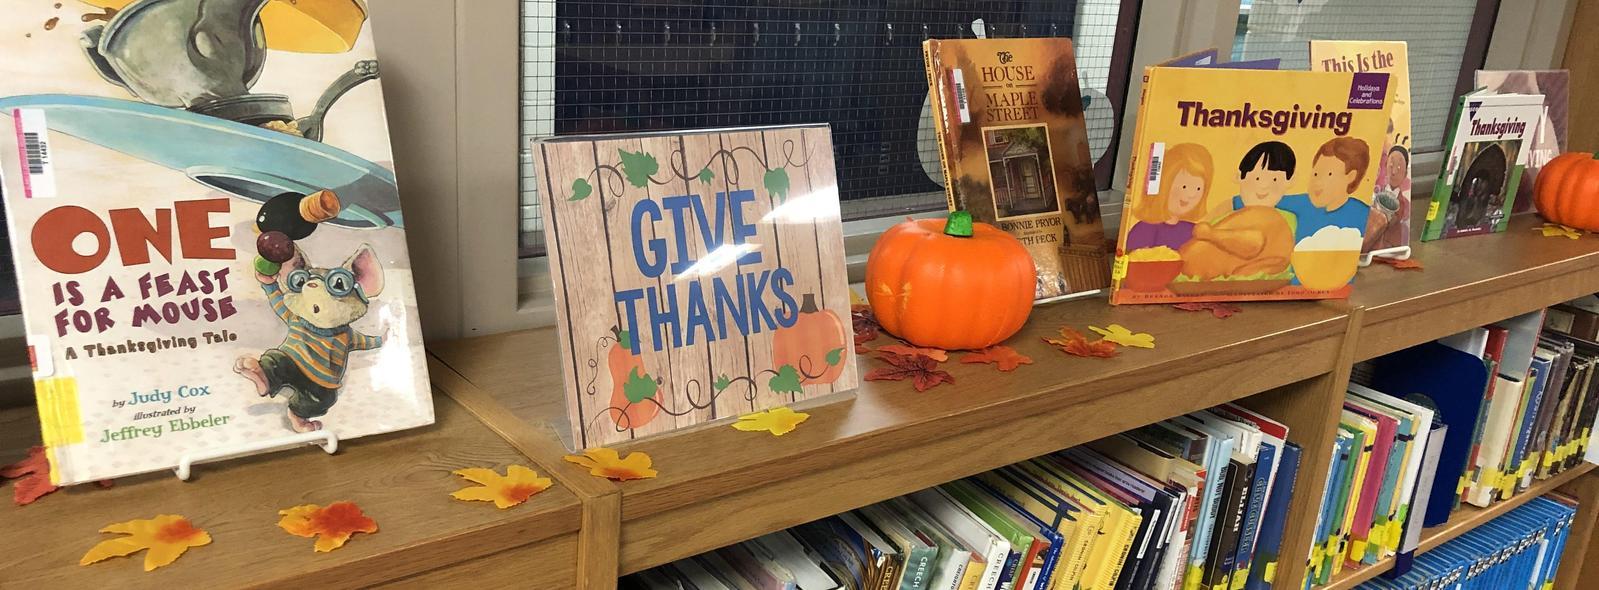 shelf of thankgiving books